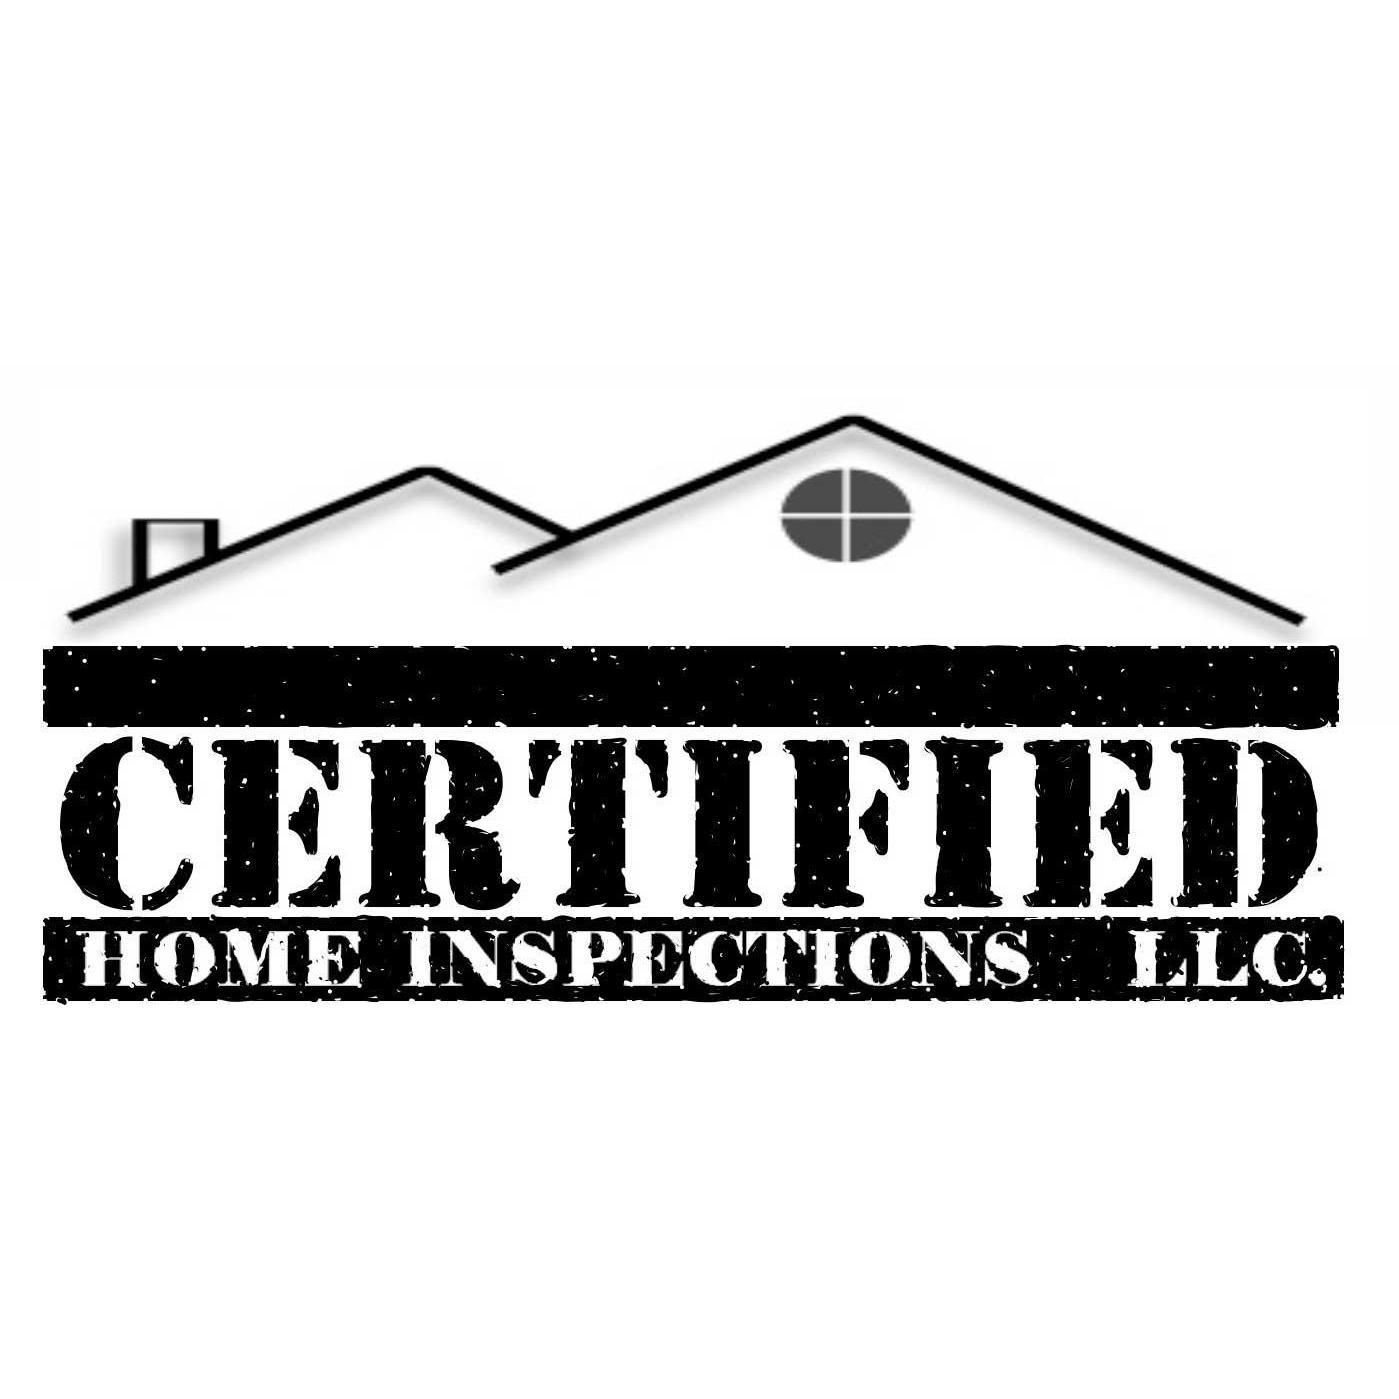 Certified Home Inspections LLC - Saint Paul, MN - Home Inspectors